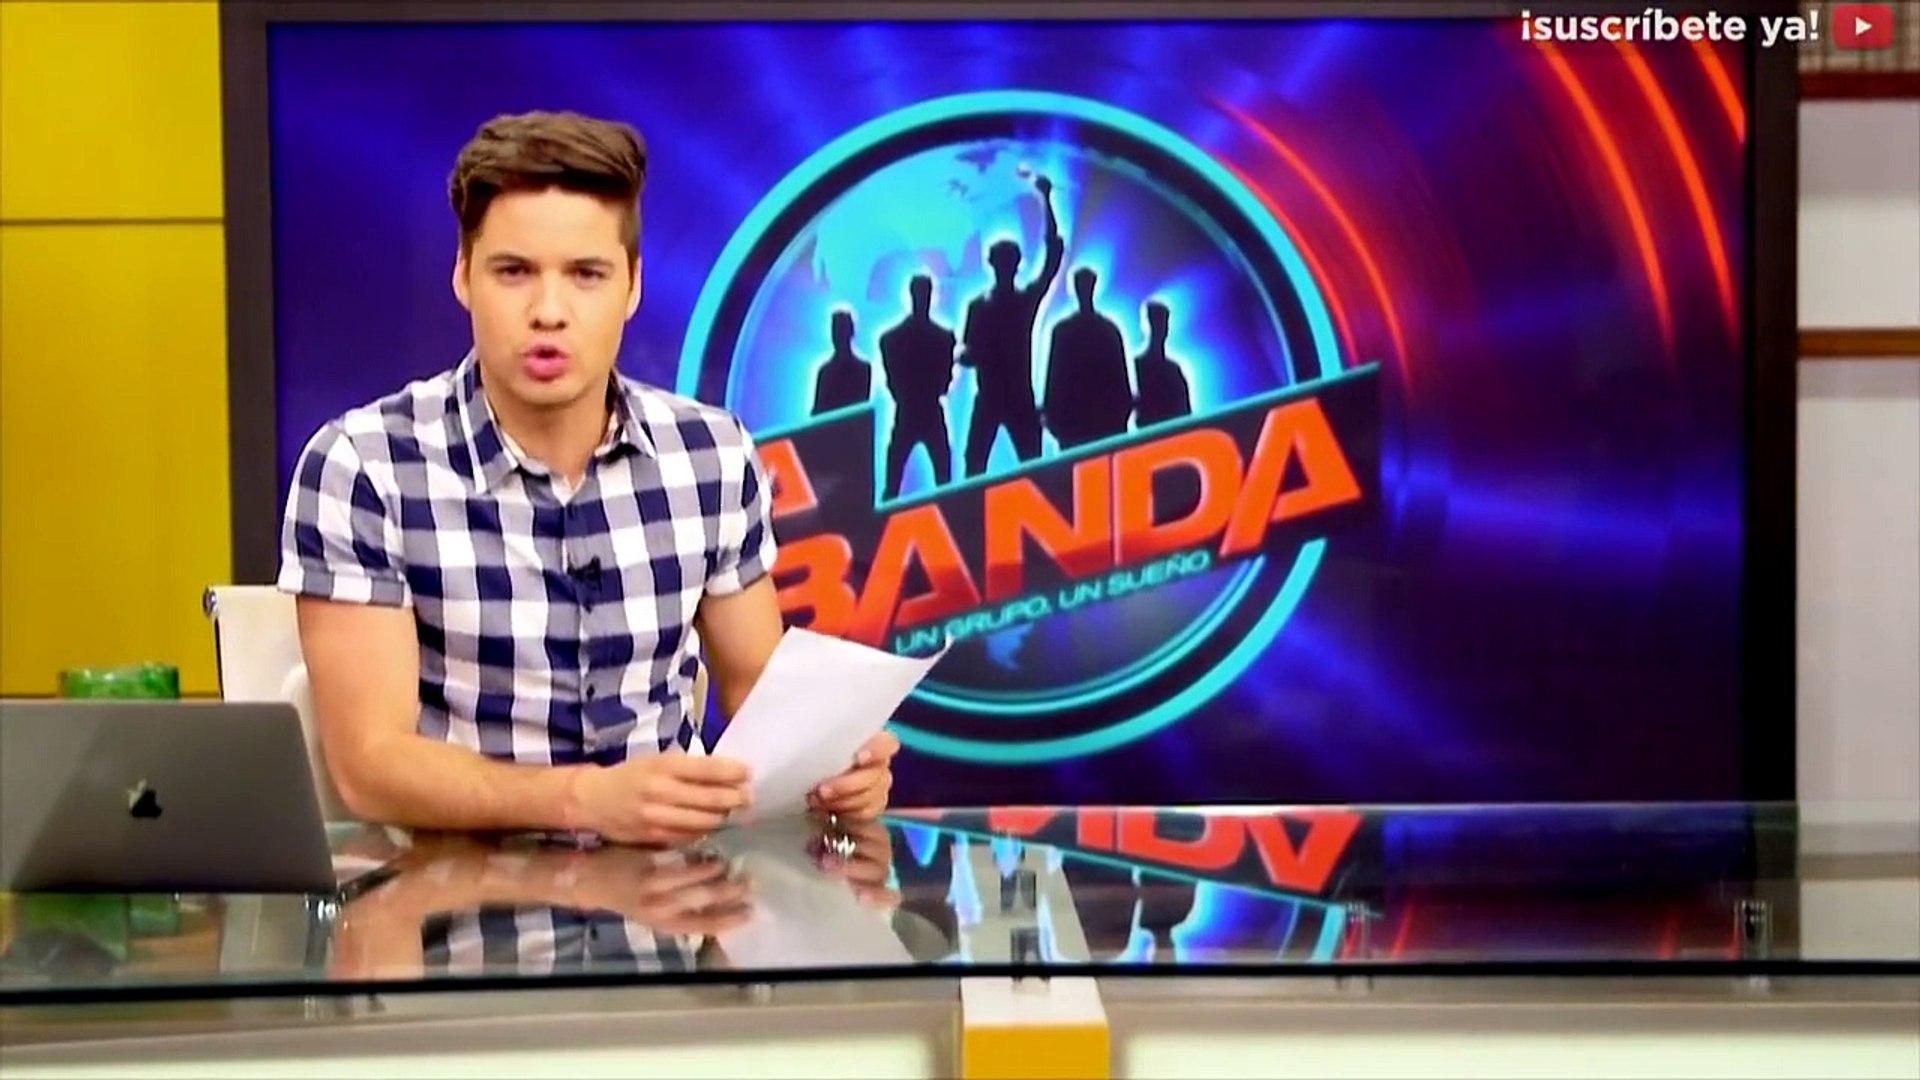 William Valdés brings you La Banda que se robó el show in La Banda News